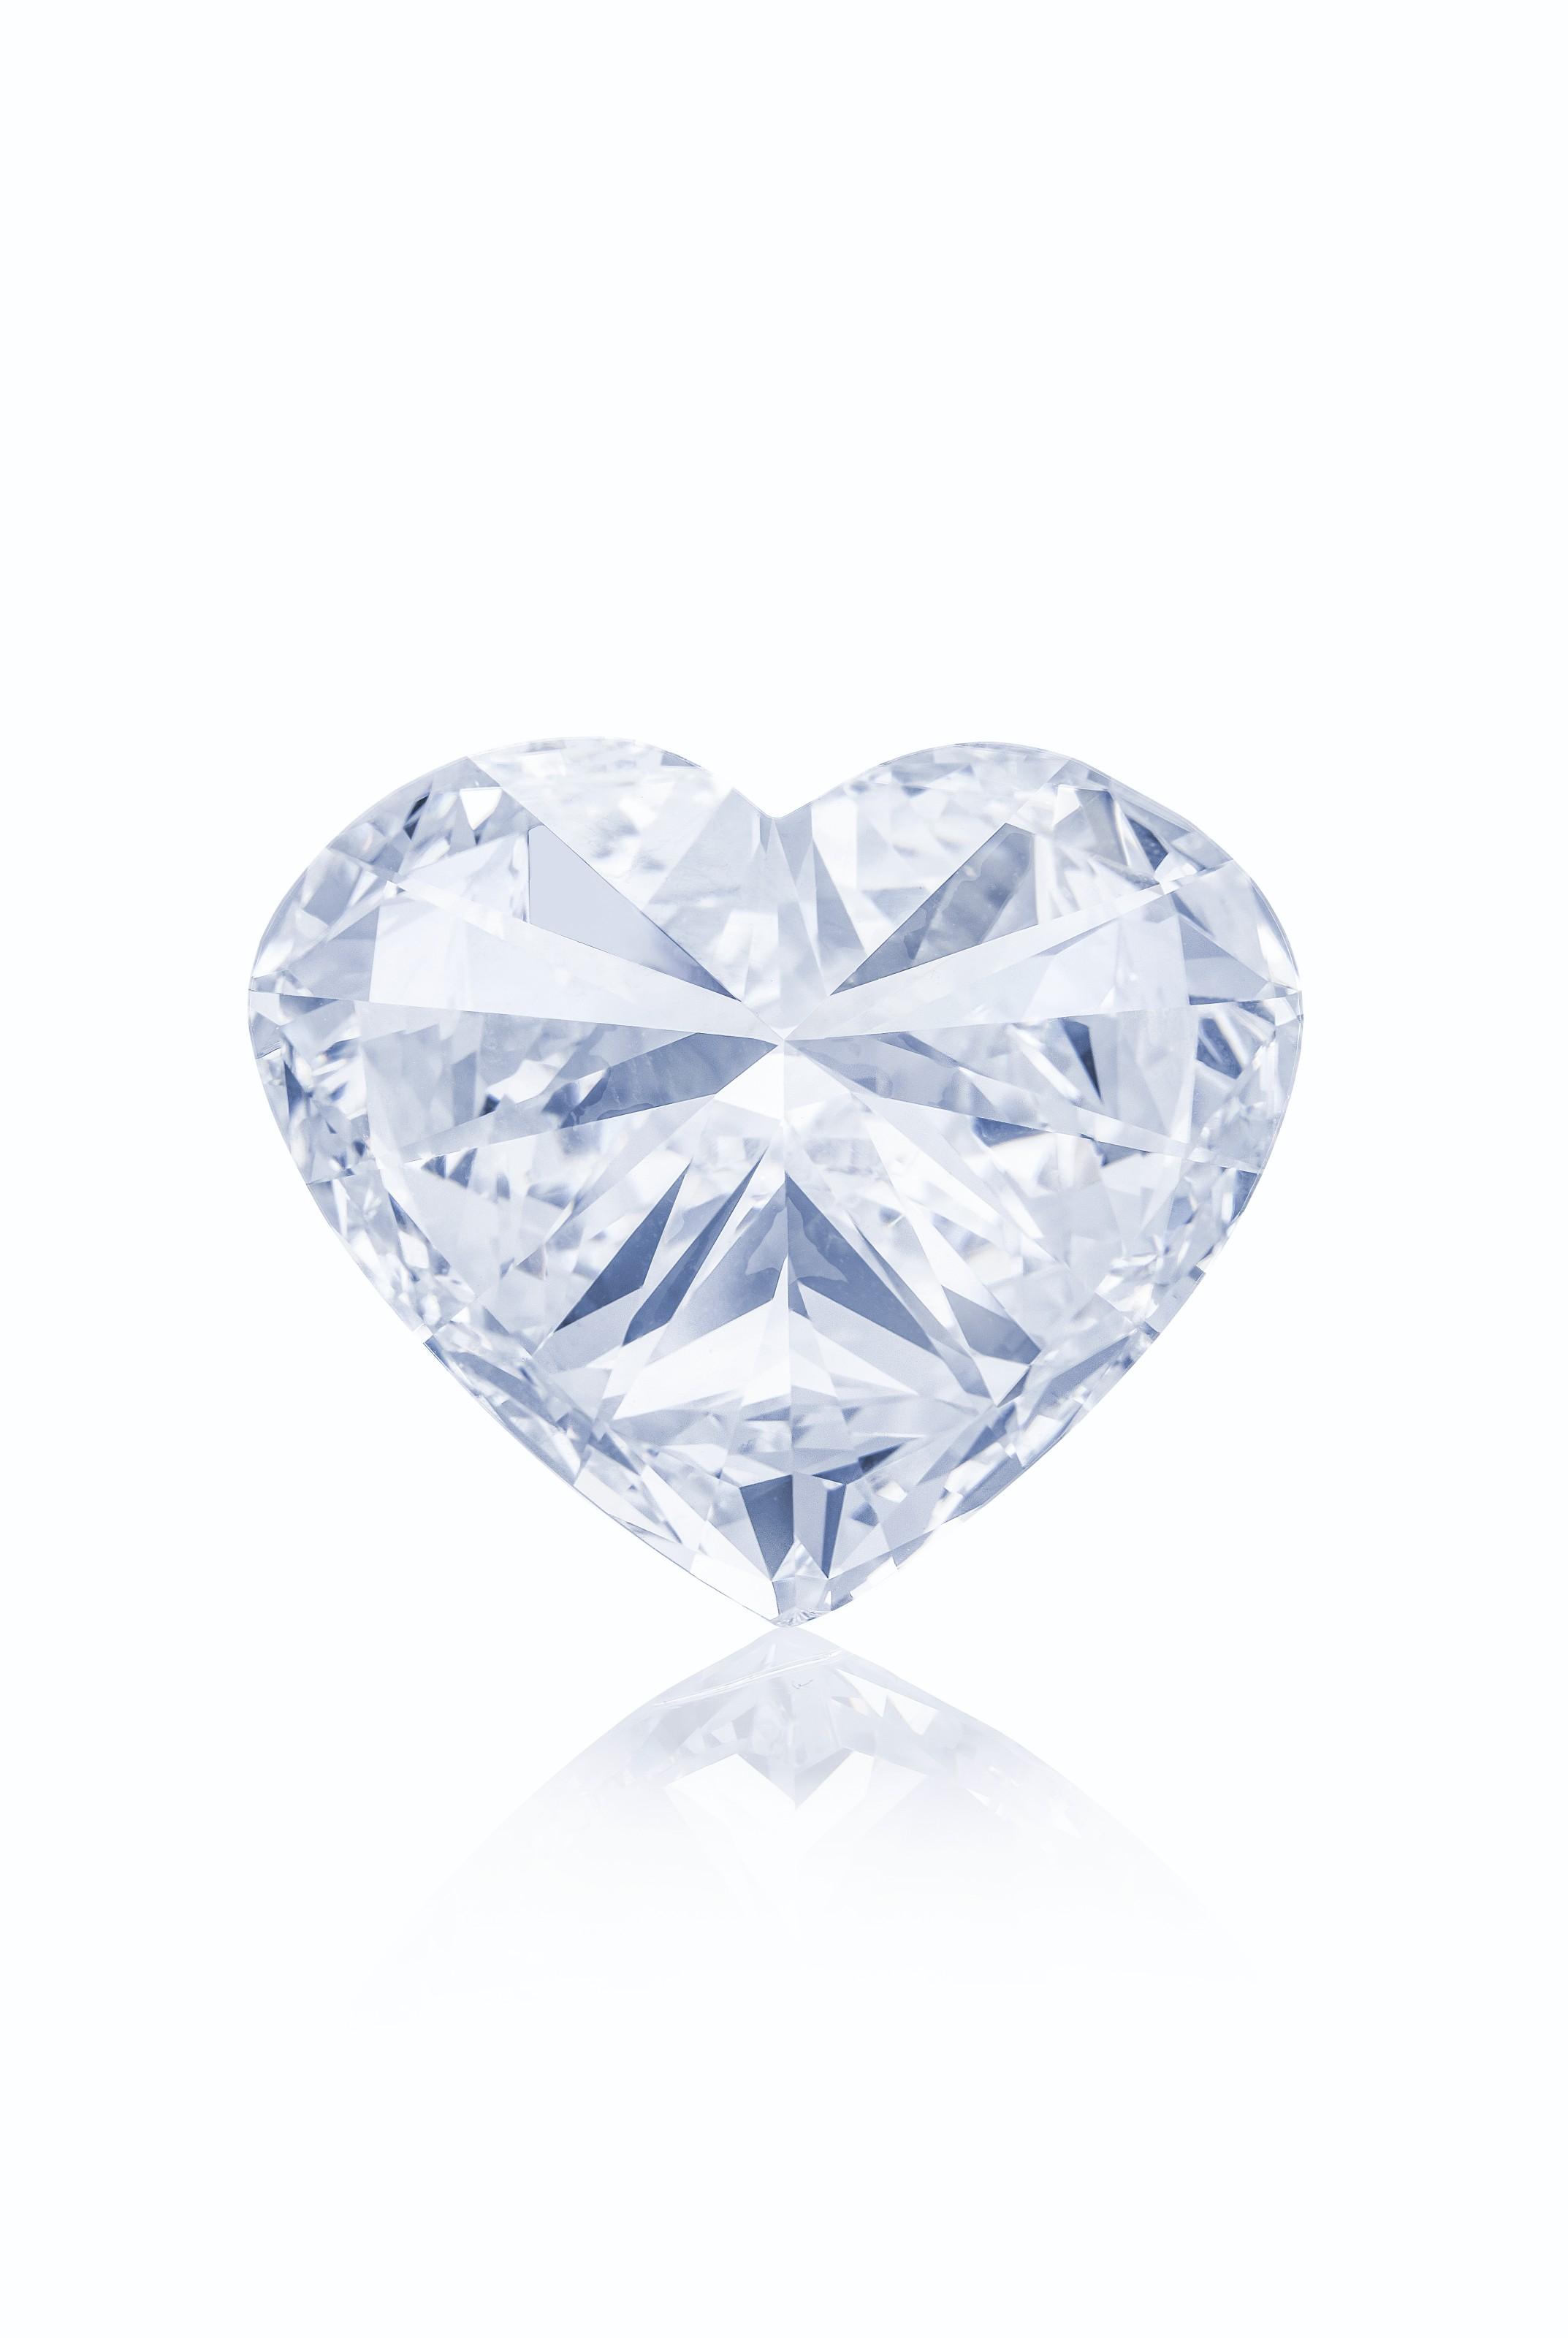 SUPERB DIAMOND PENDANT